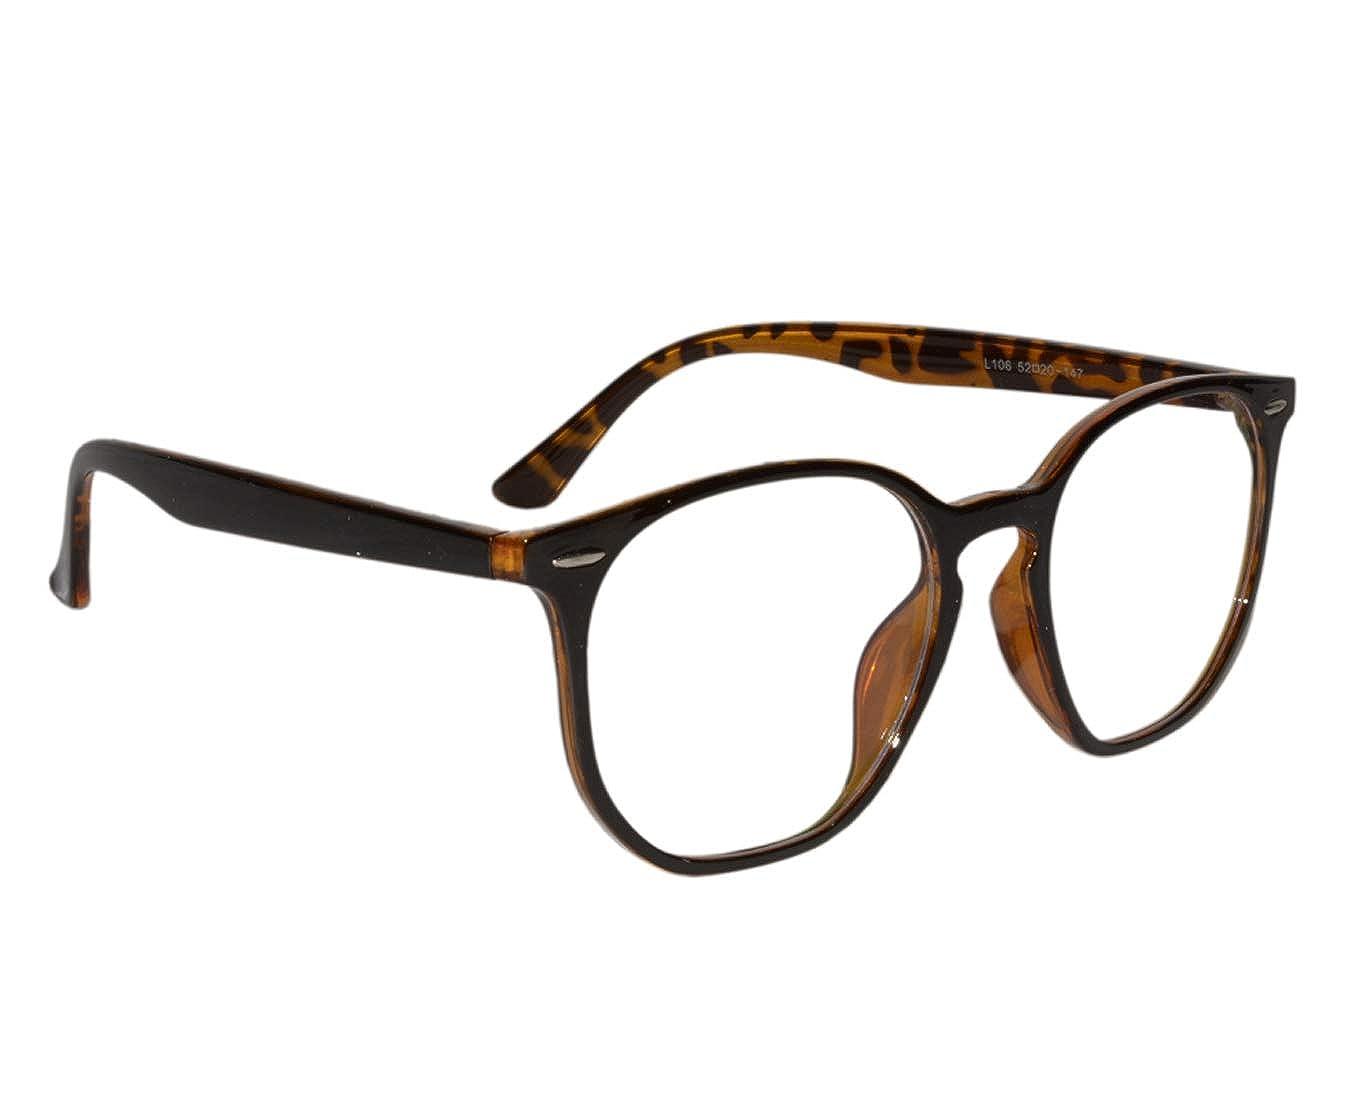 ed54cddd75 Peter Jones Stylish Brown Tiger Print Square Unisex Optical Frame (106IDA)   Amazon.in  Clothing   Accessories